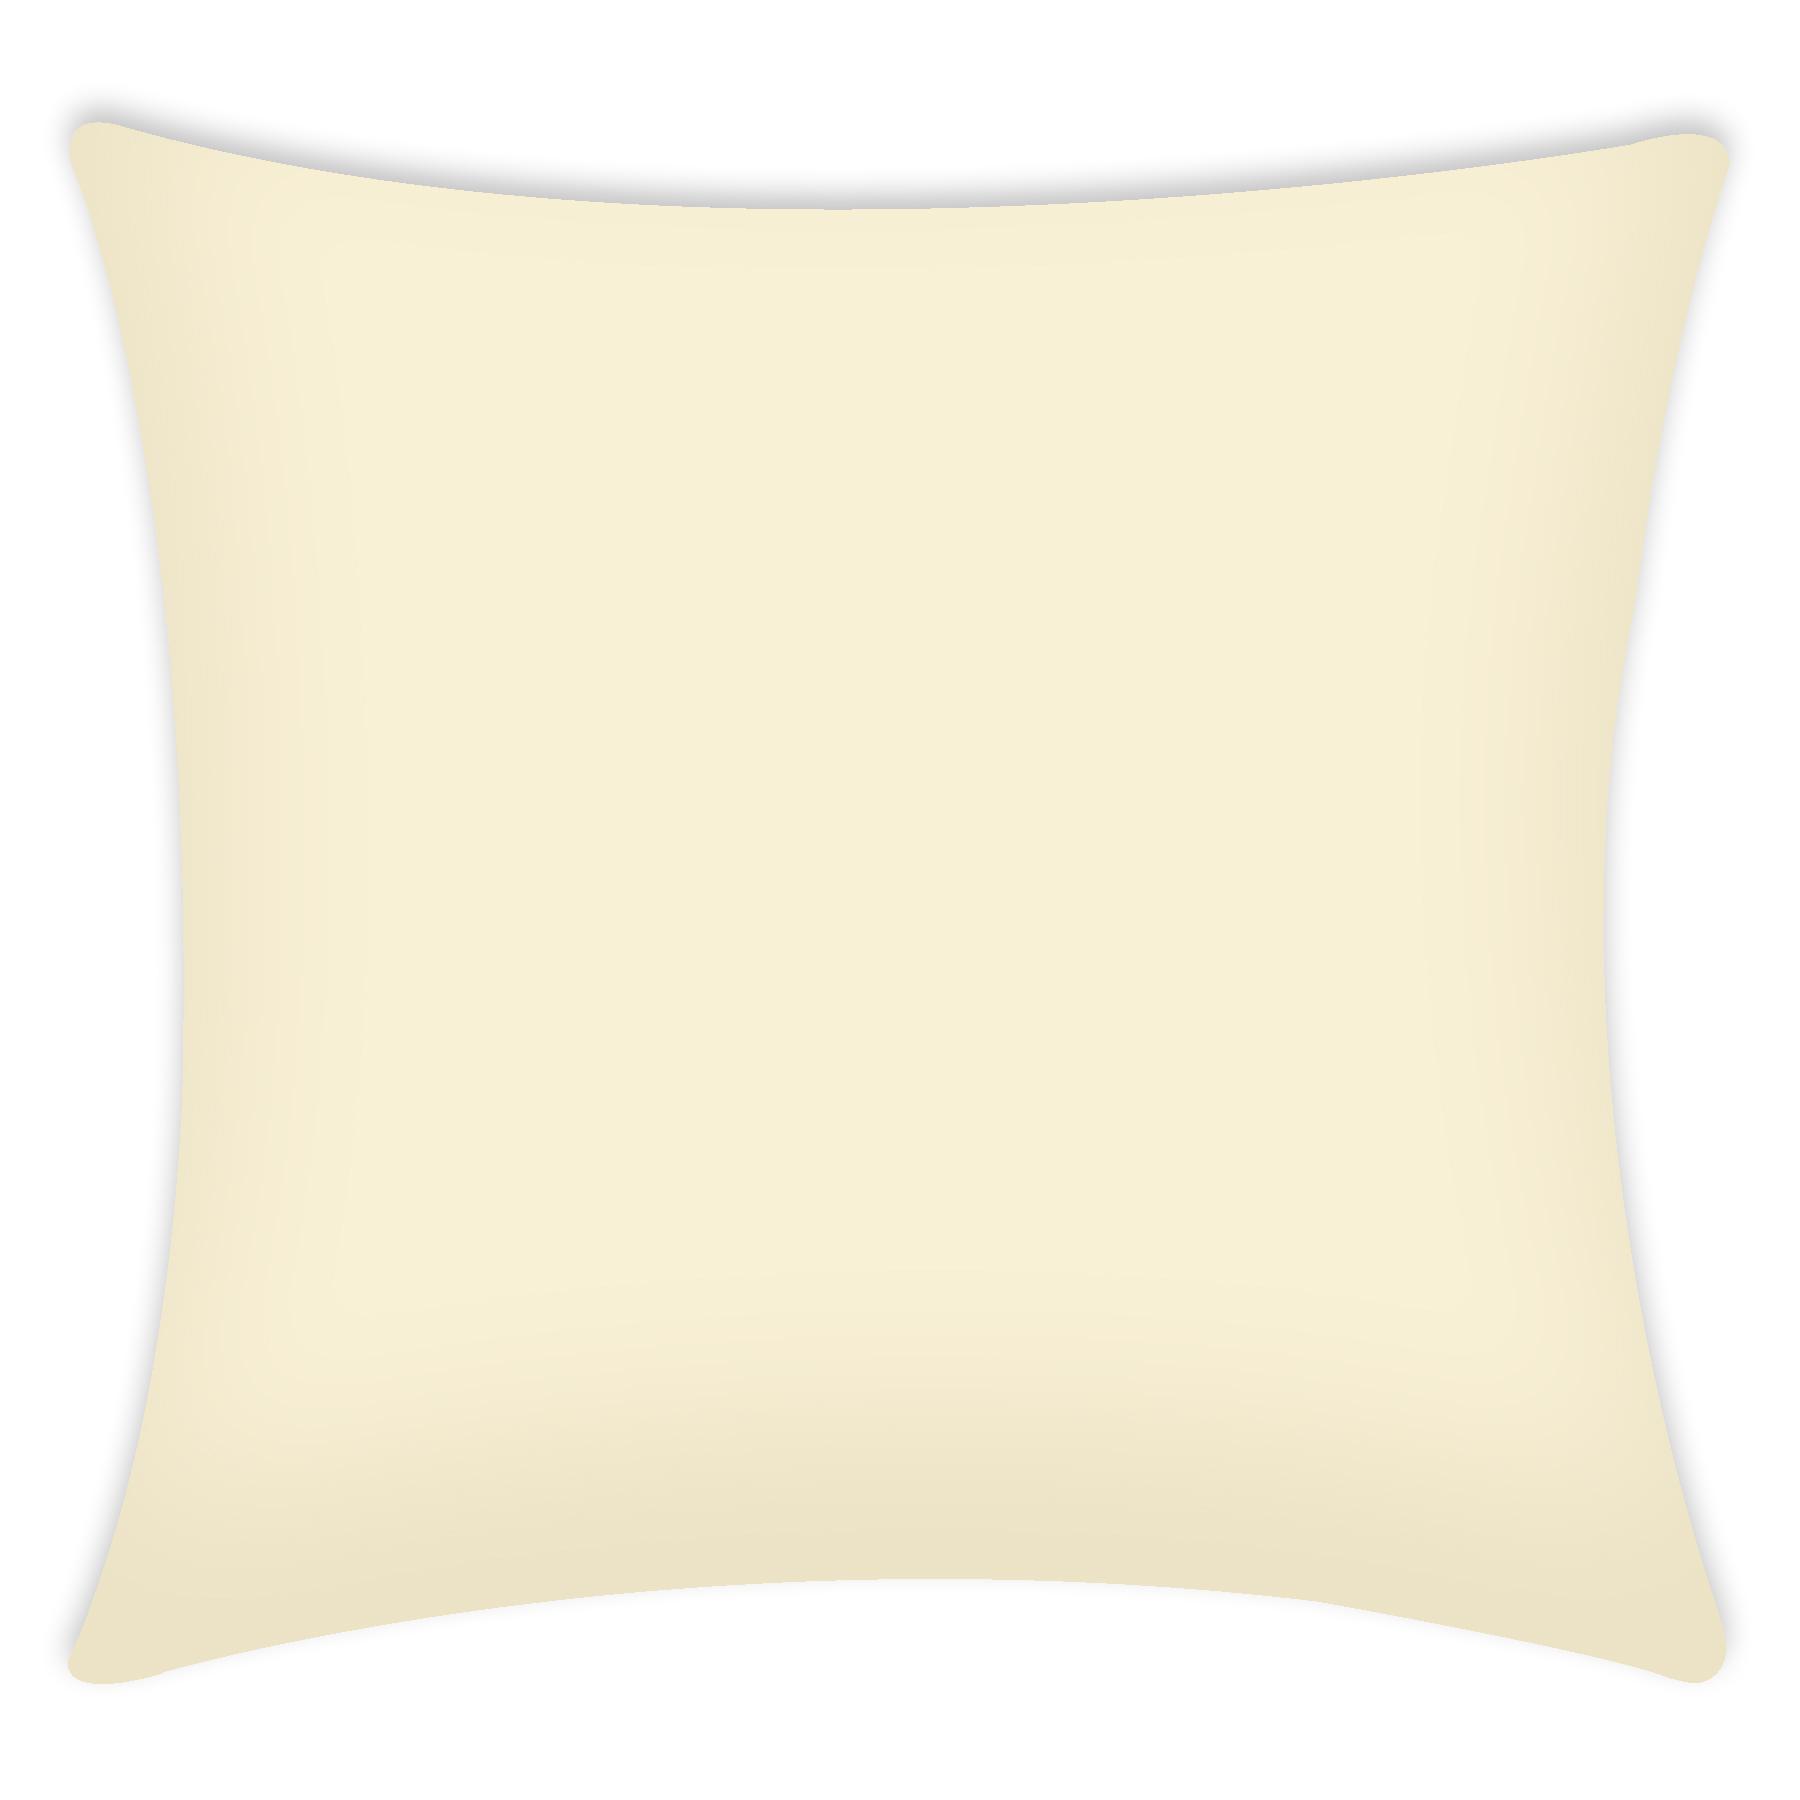 kissenbezug kissenh lle sofakissen baumwolle kopfkissen. Black Bedroom Furniture Sets. Home Design Ideas